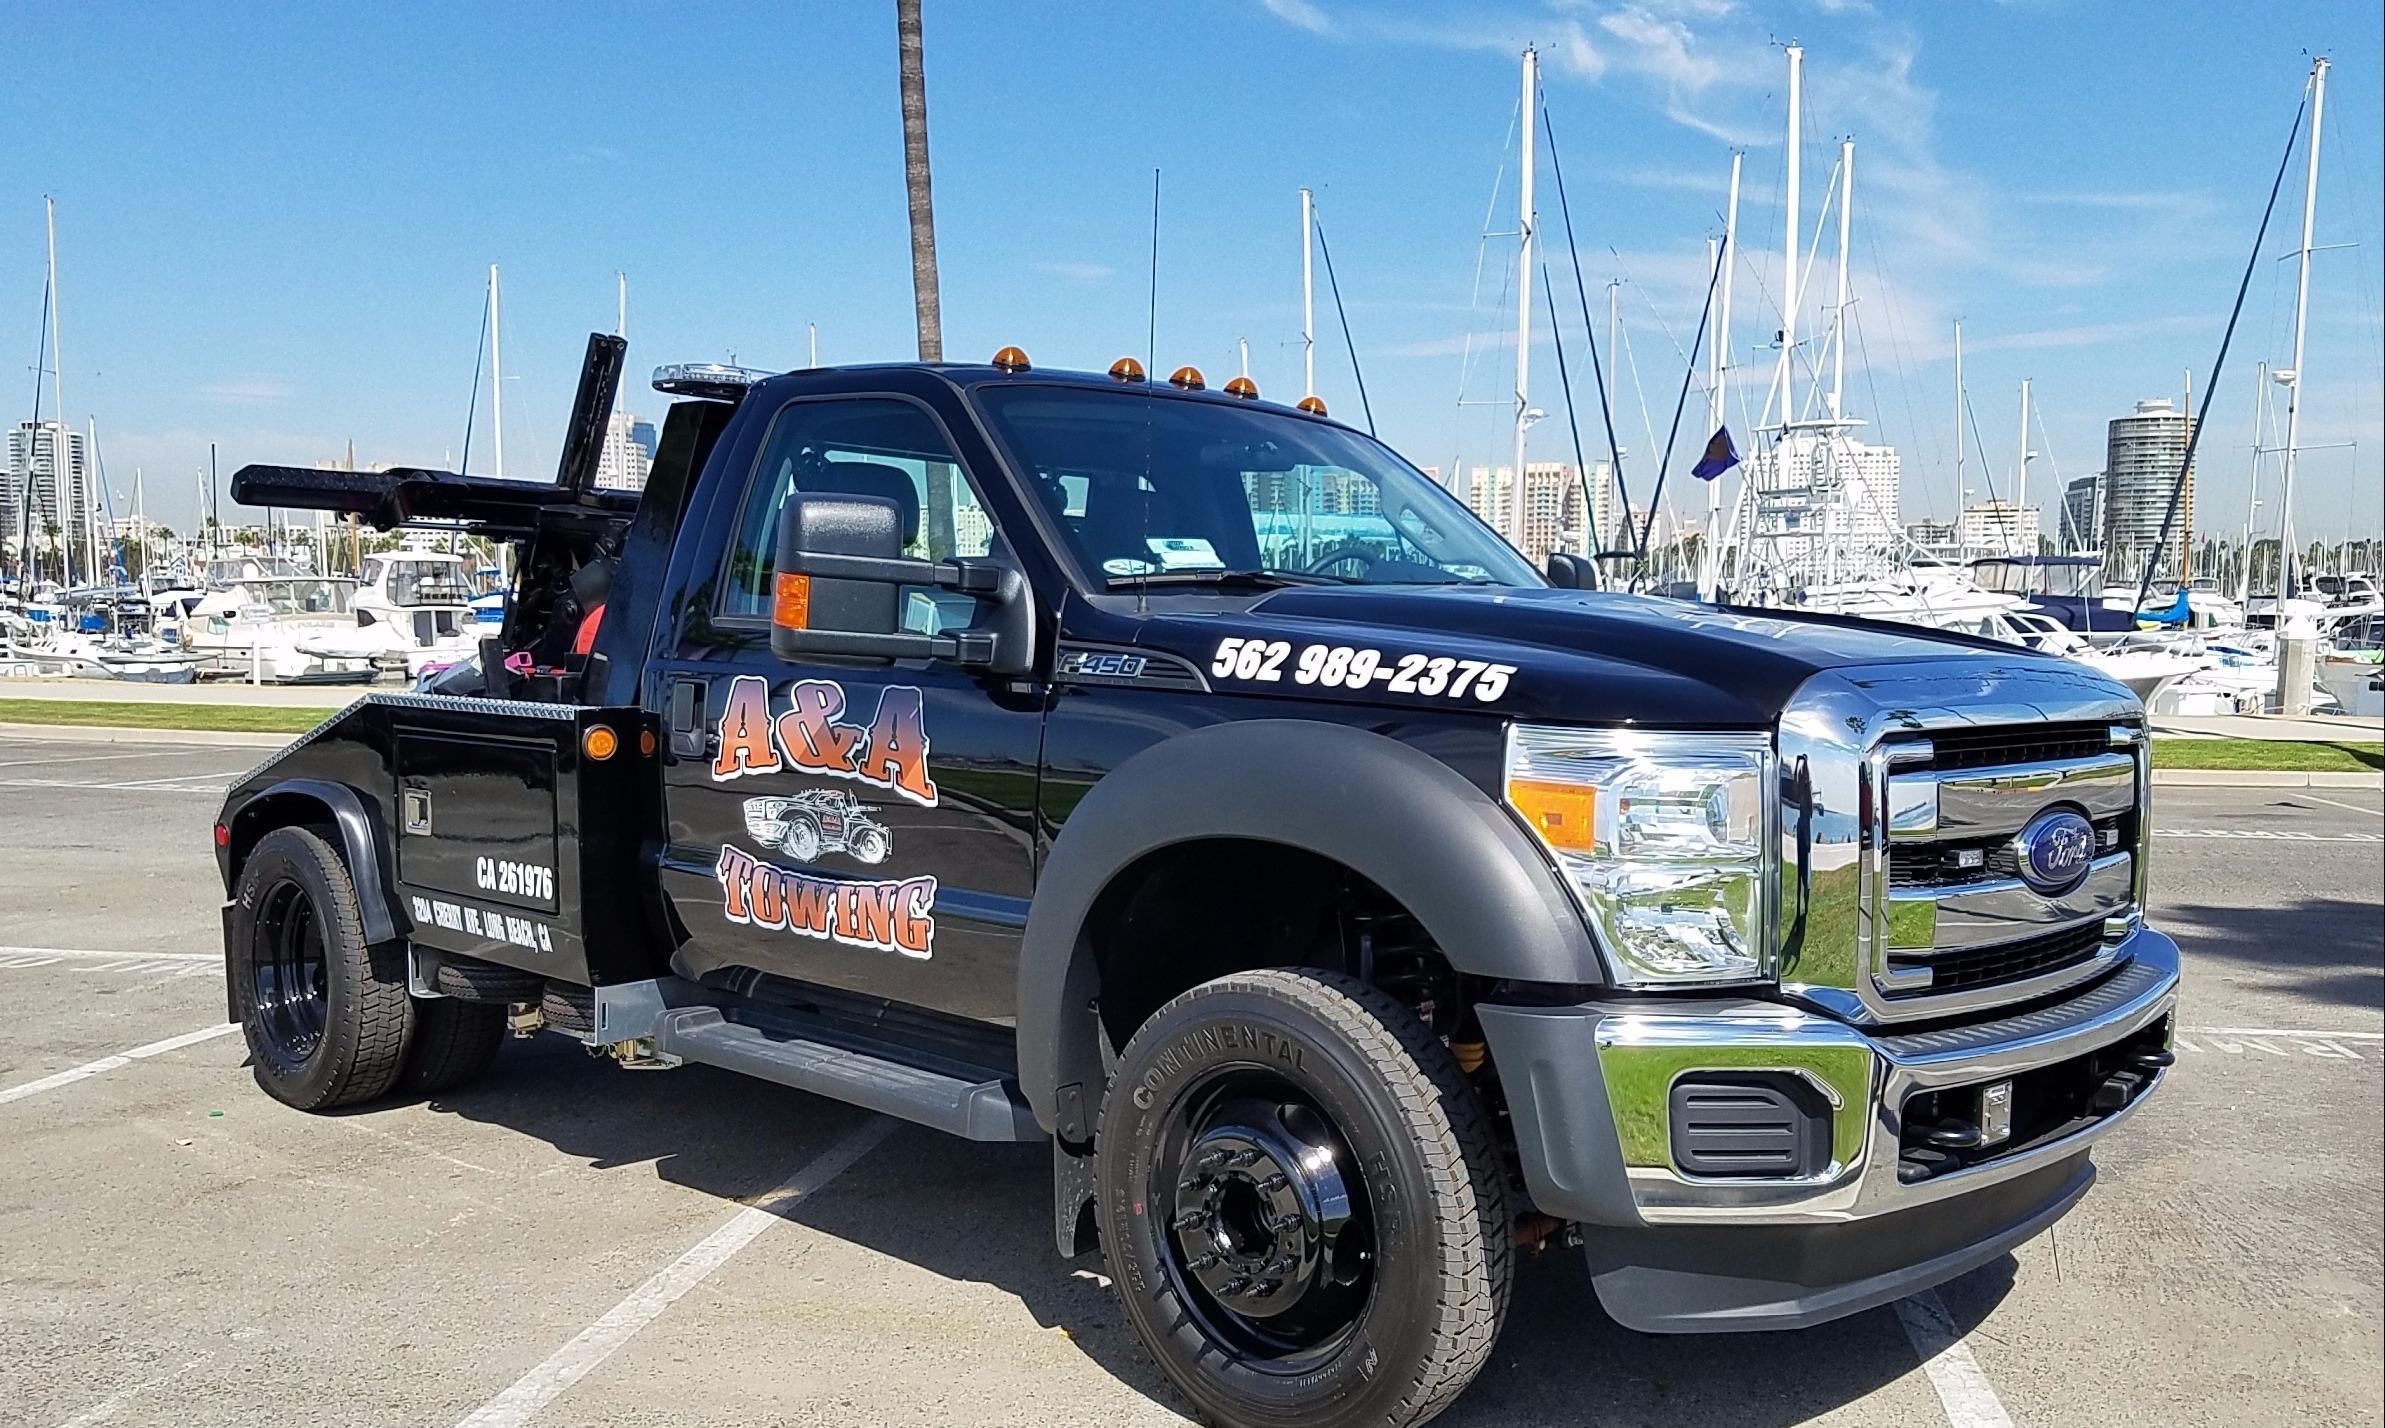 City Tow Service Long Beach Ca